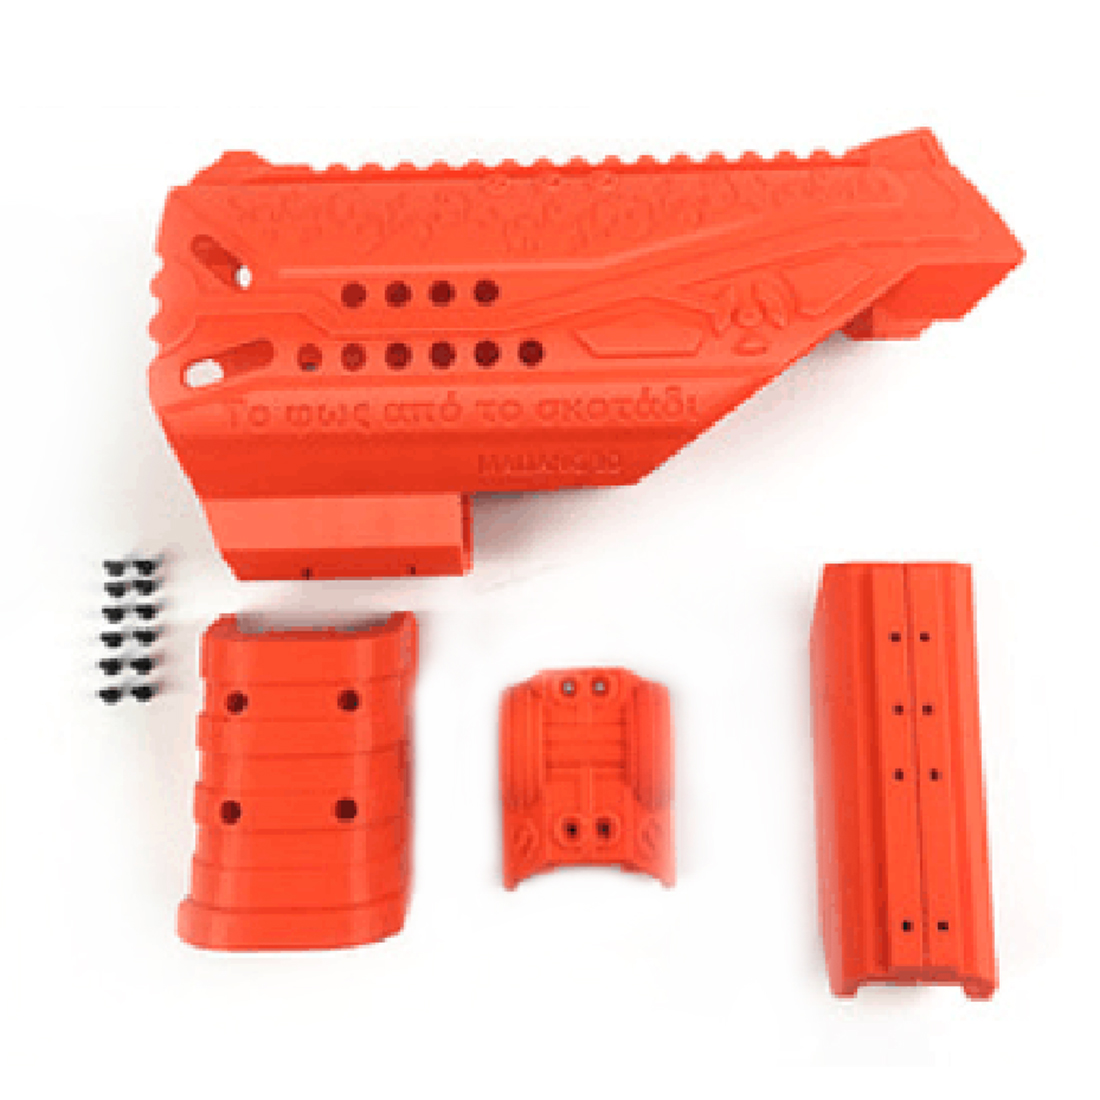 Surwish Maliang 3D Printing Modified Kit for Nerf N-Strike Elite Strongarm Blaster worker twill metal power type flywheel set for nerf n strike elite stryfe blaster nerf n strike elite rapidstrike cs 18 blaster